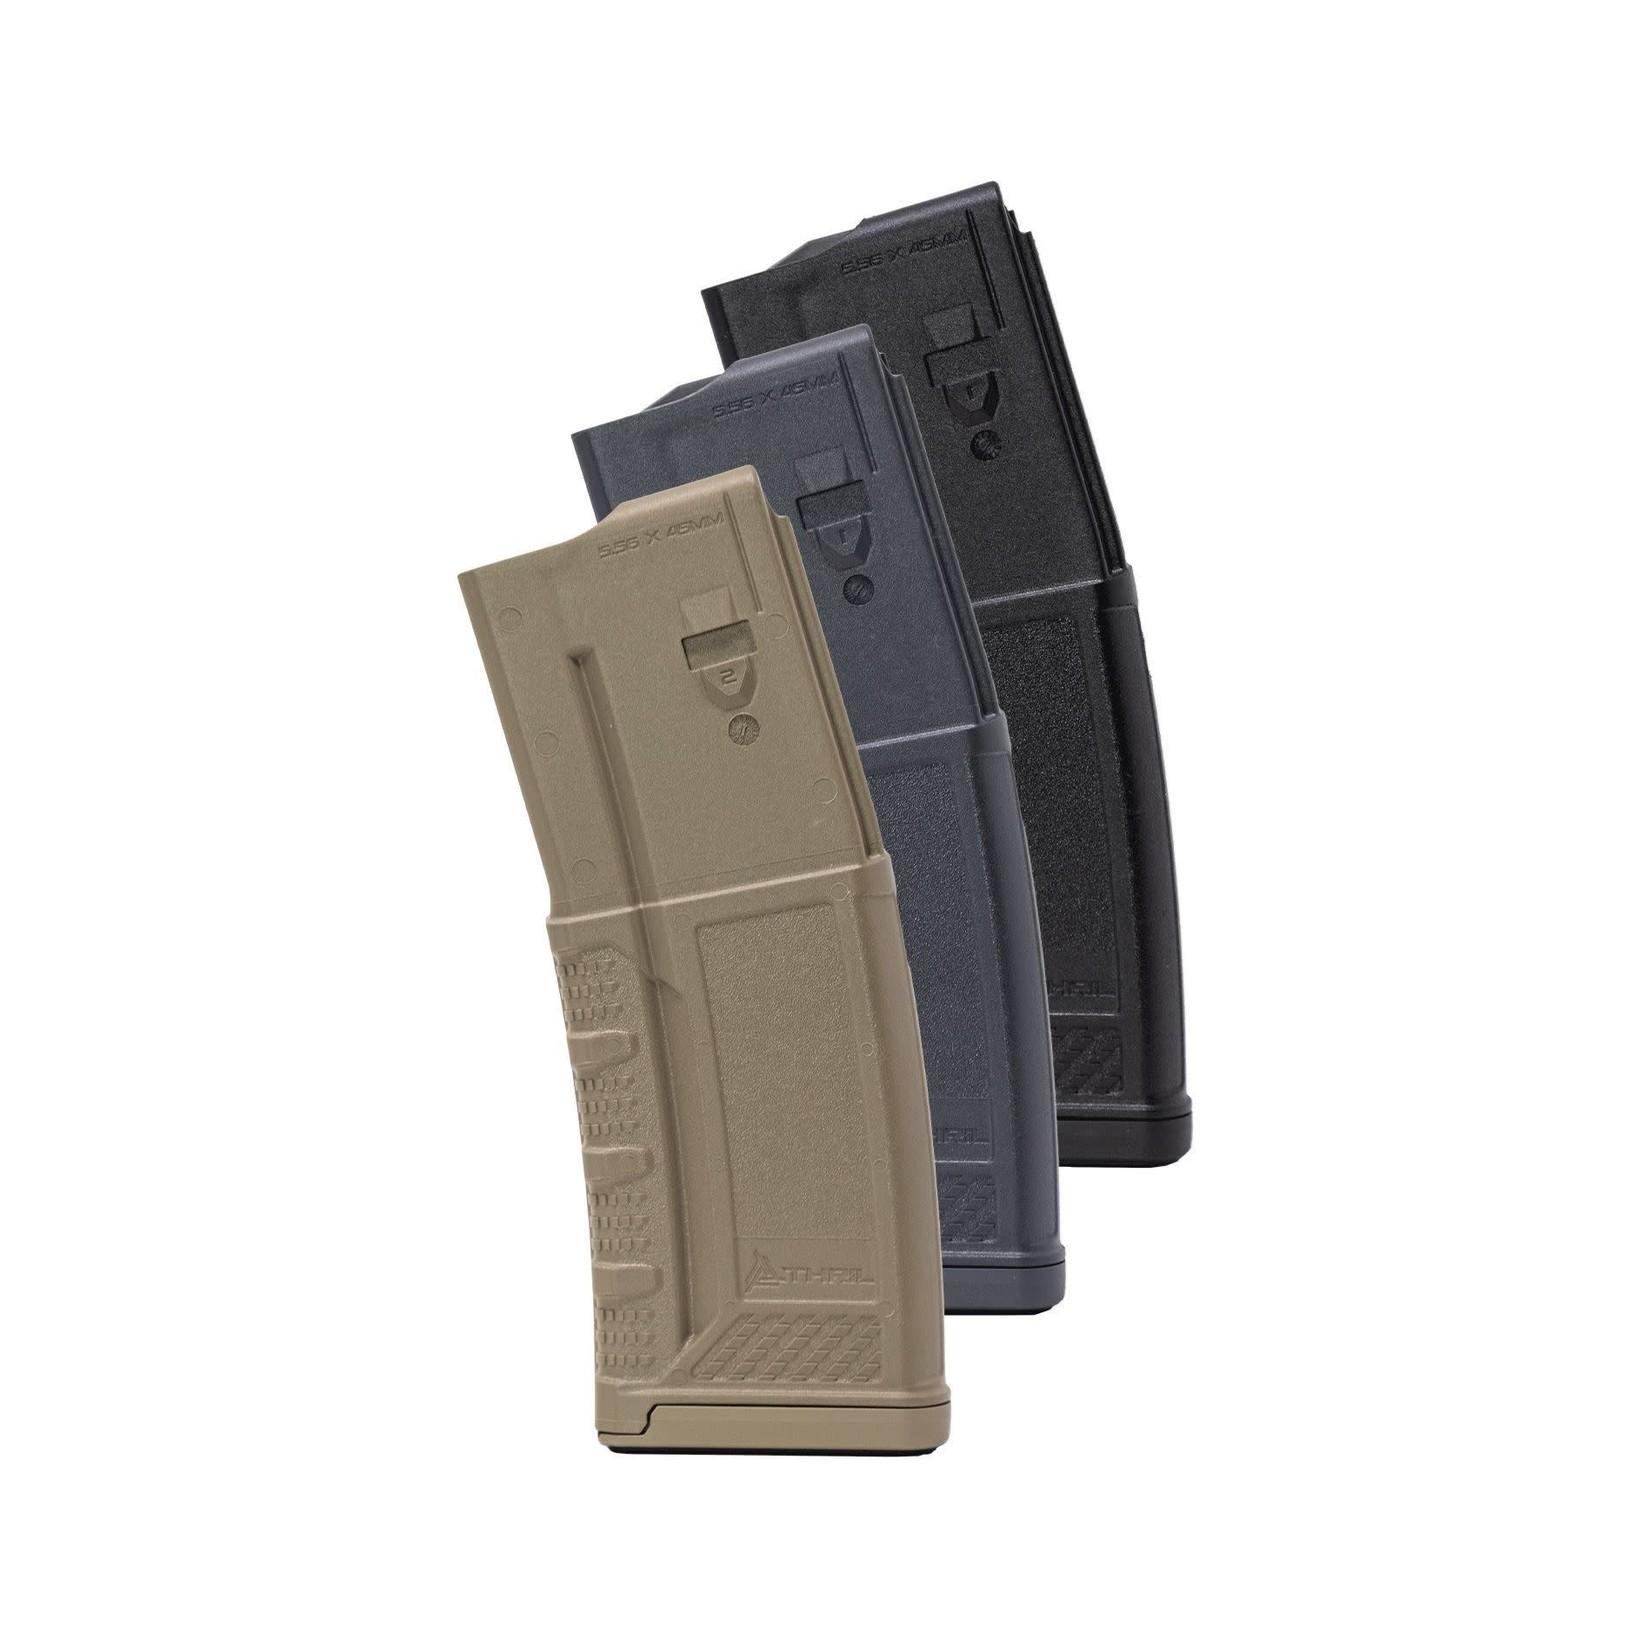 Thril THRiL USA 5.56x45mm Gray Polymer 30 Round Magazine